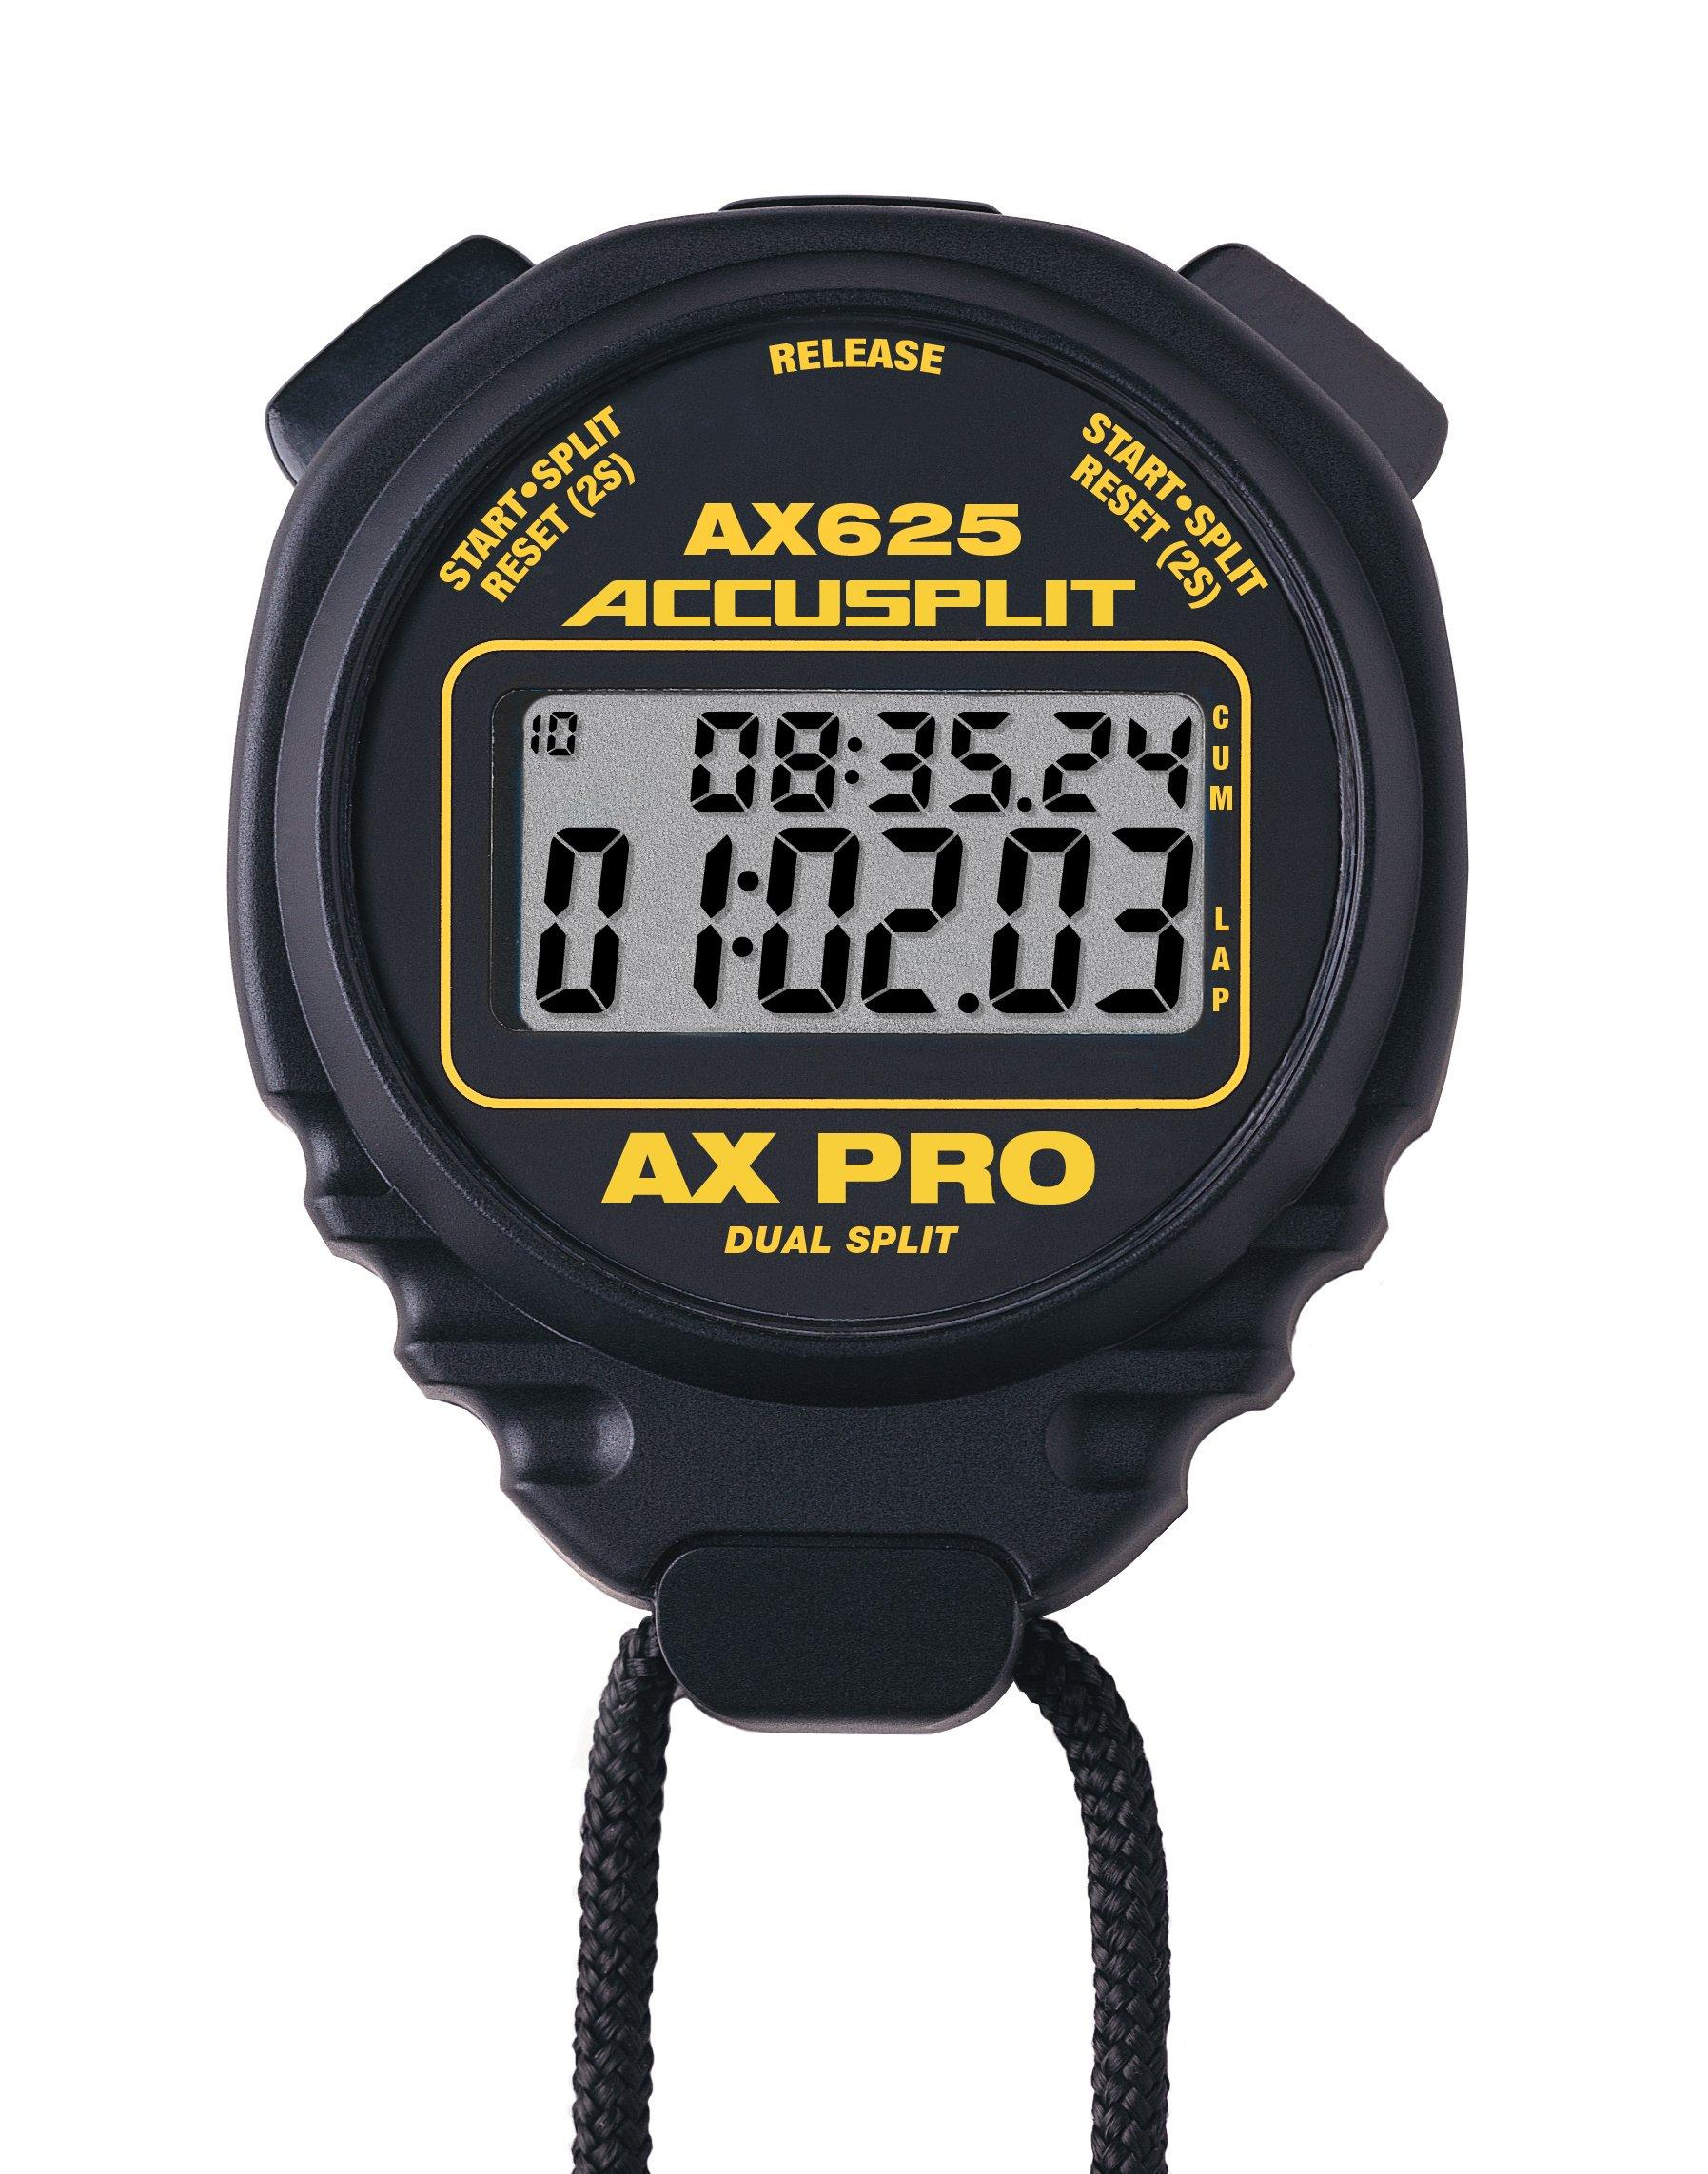 ACCUSPLIT AX625 PRO Cumulative/Lap Split Stopwatch